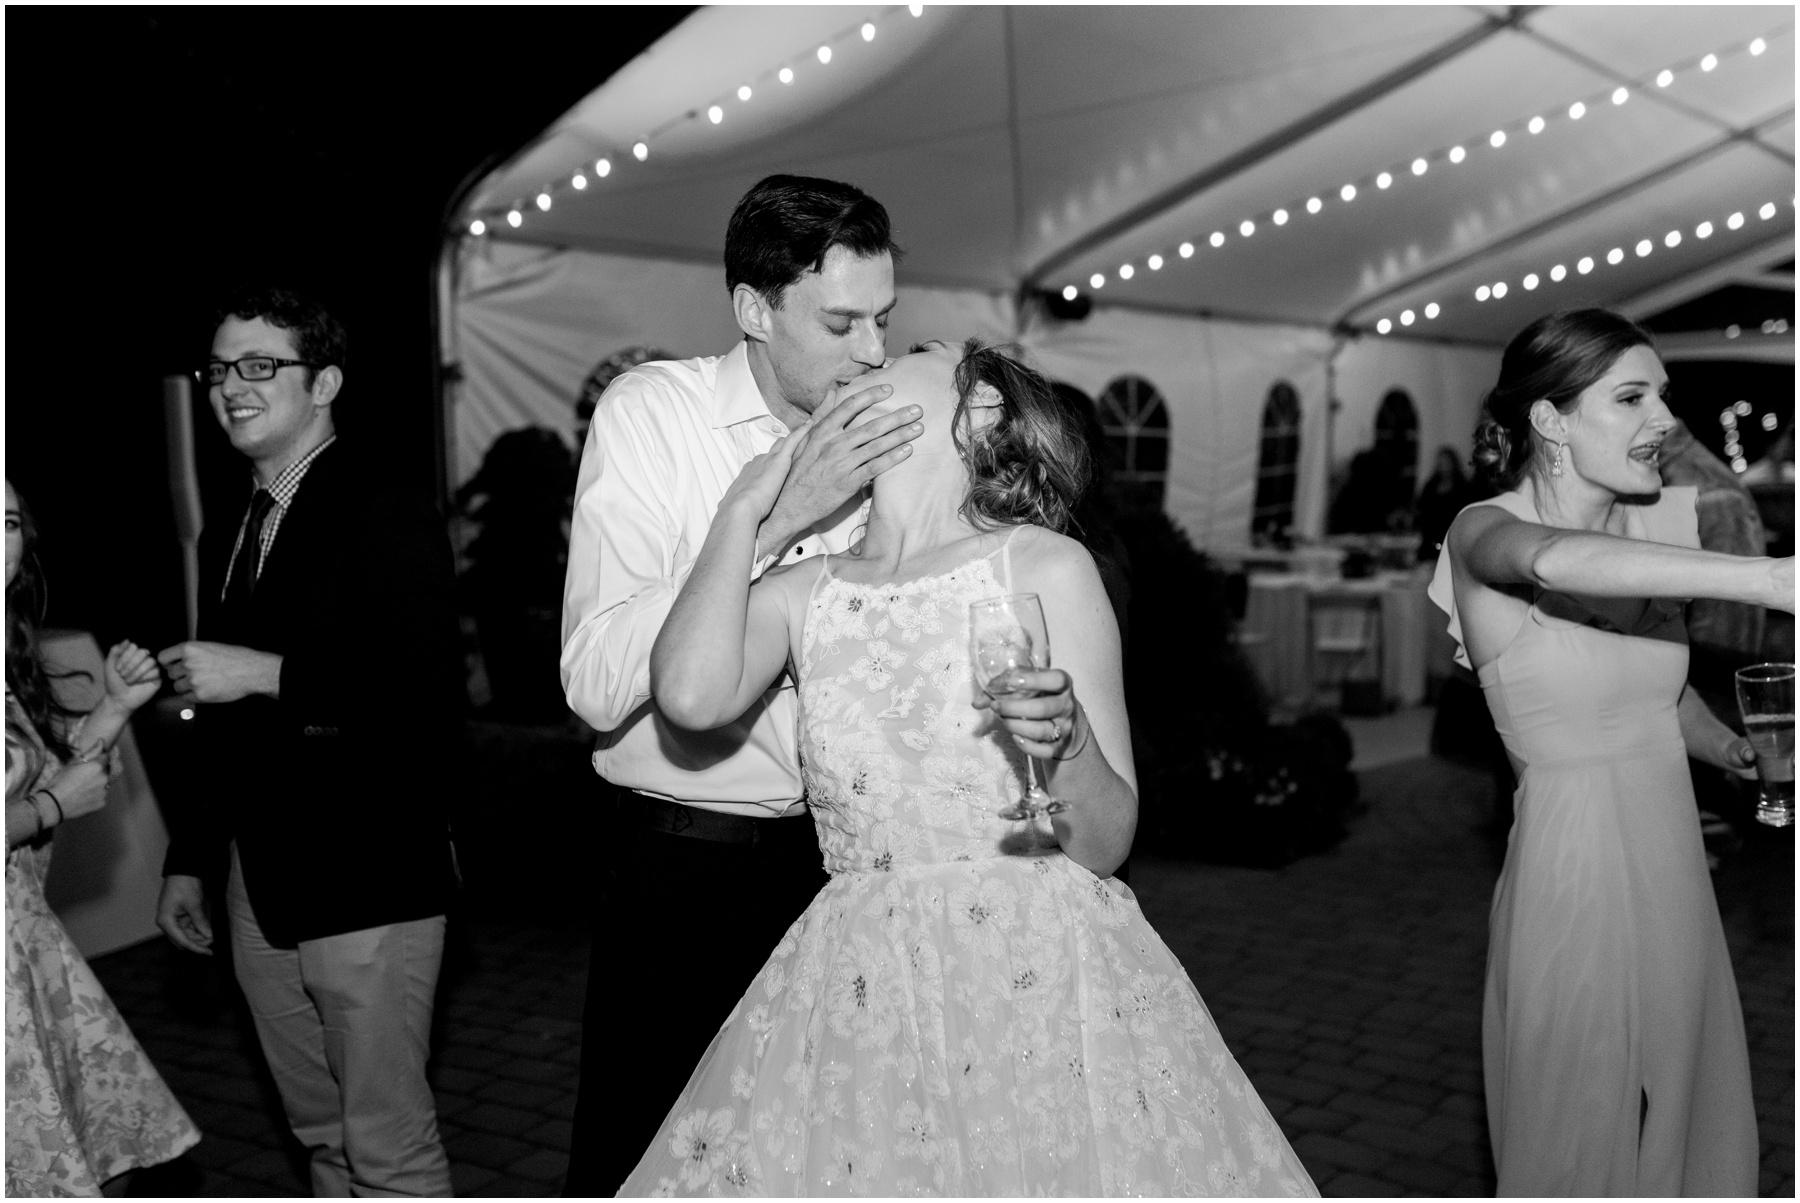 Scribner-bend-vineyards-wedding-sacramento-california-Kristine-Herman-Photography-224.jpg